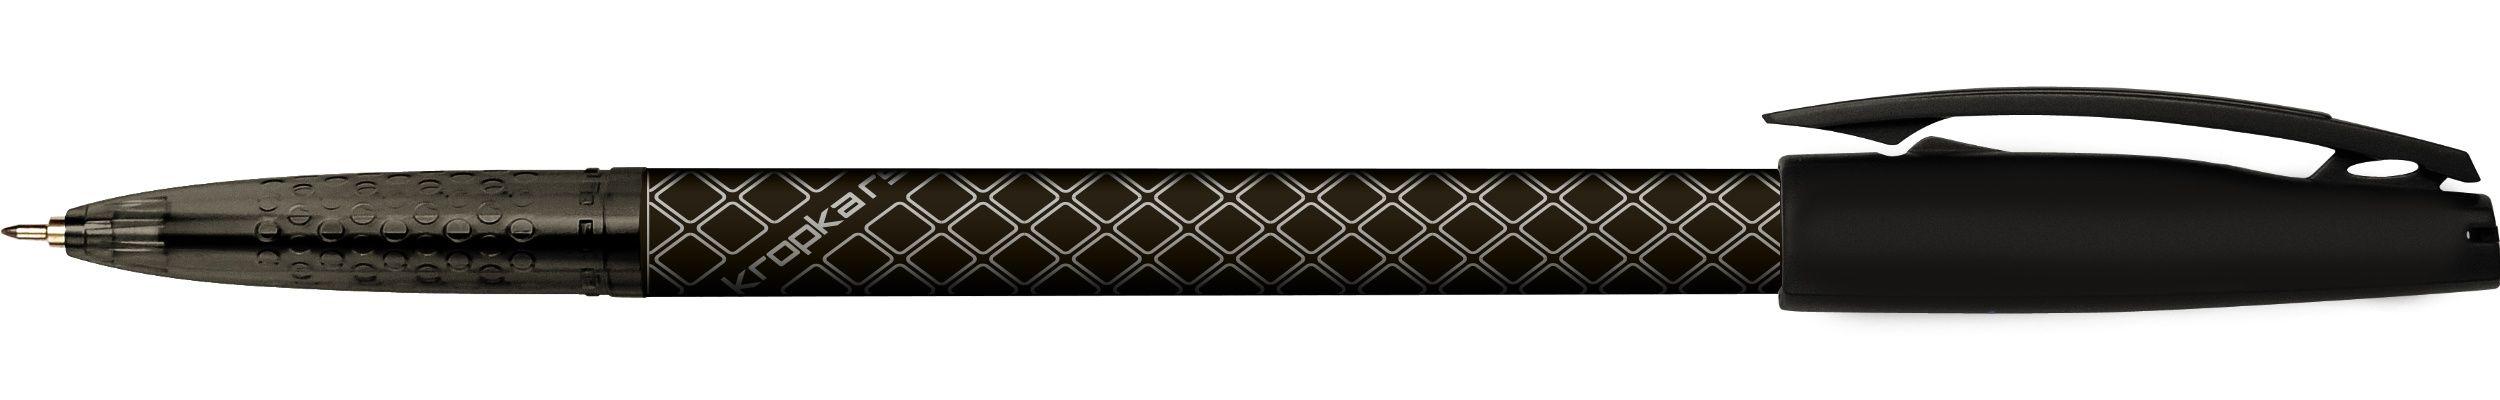 Kropka RS Ballpoint Pen